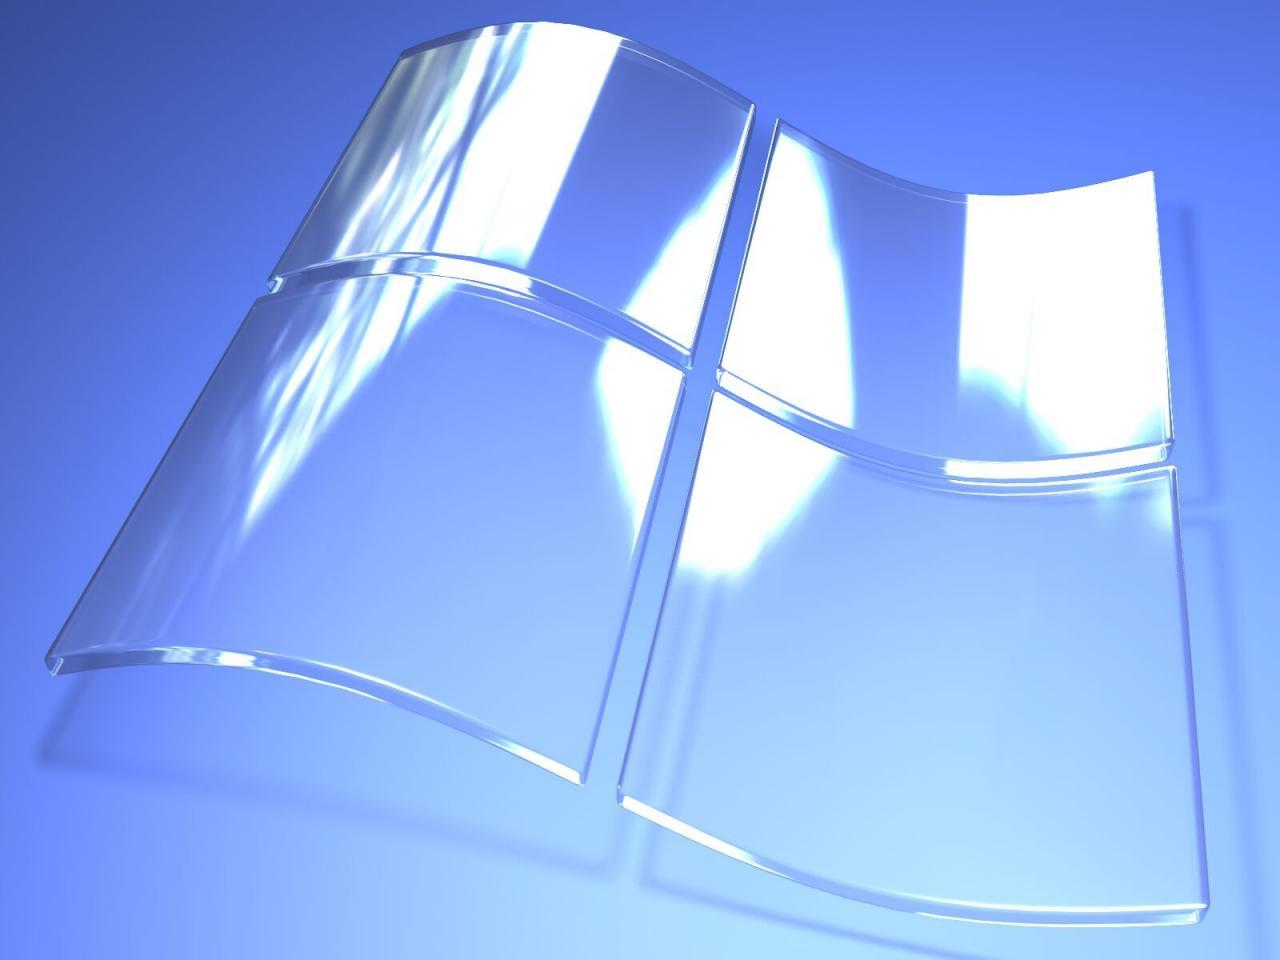 Wallpaper transparant Theme Windows XP